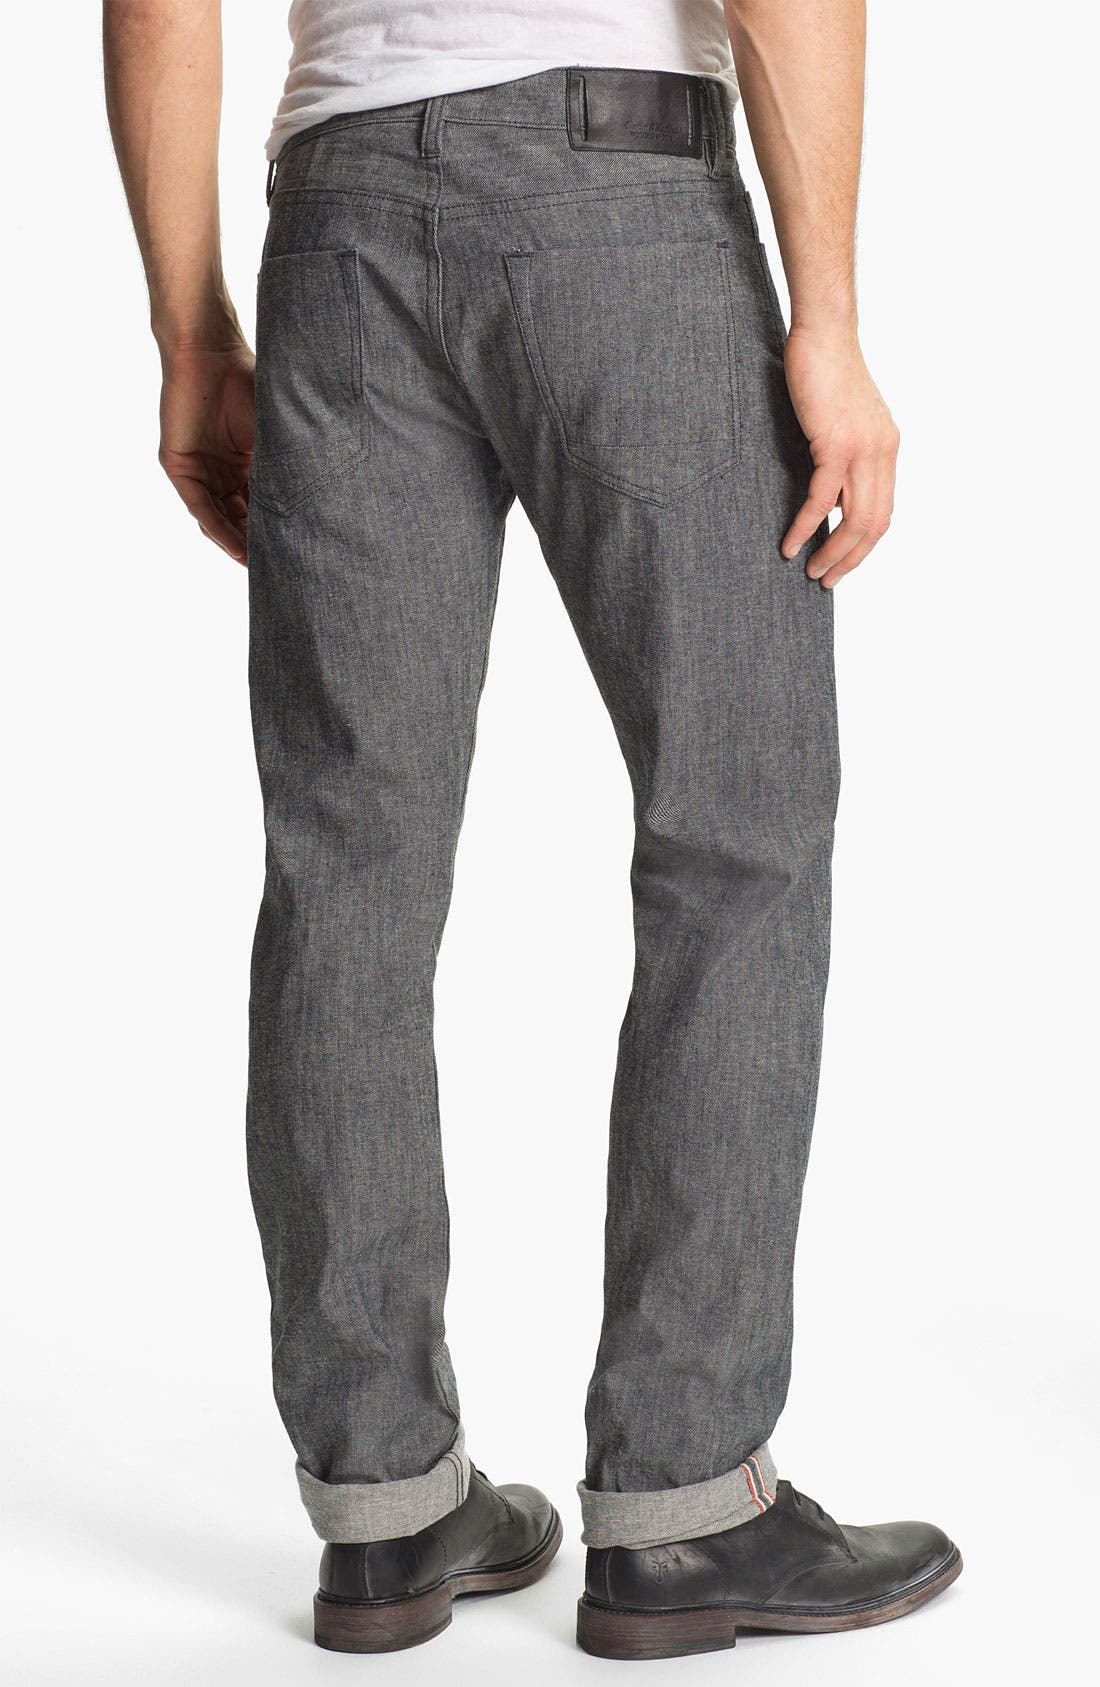 Main Image - Denim & Leathers by Andrew Marc Tweed Slim Straight Leg Selvedge Jeans (Grey)